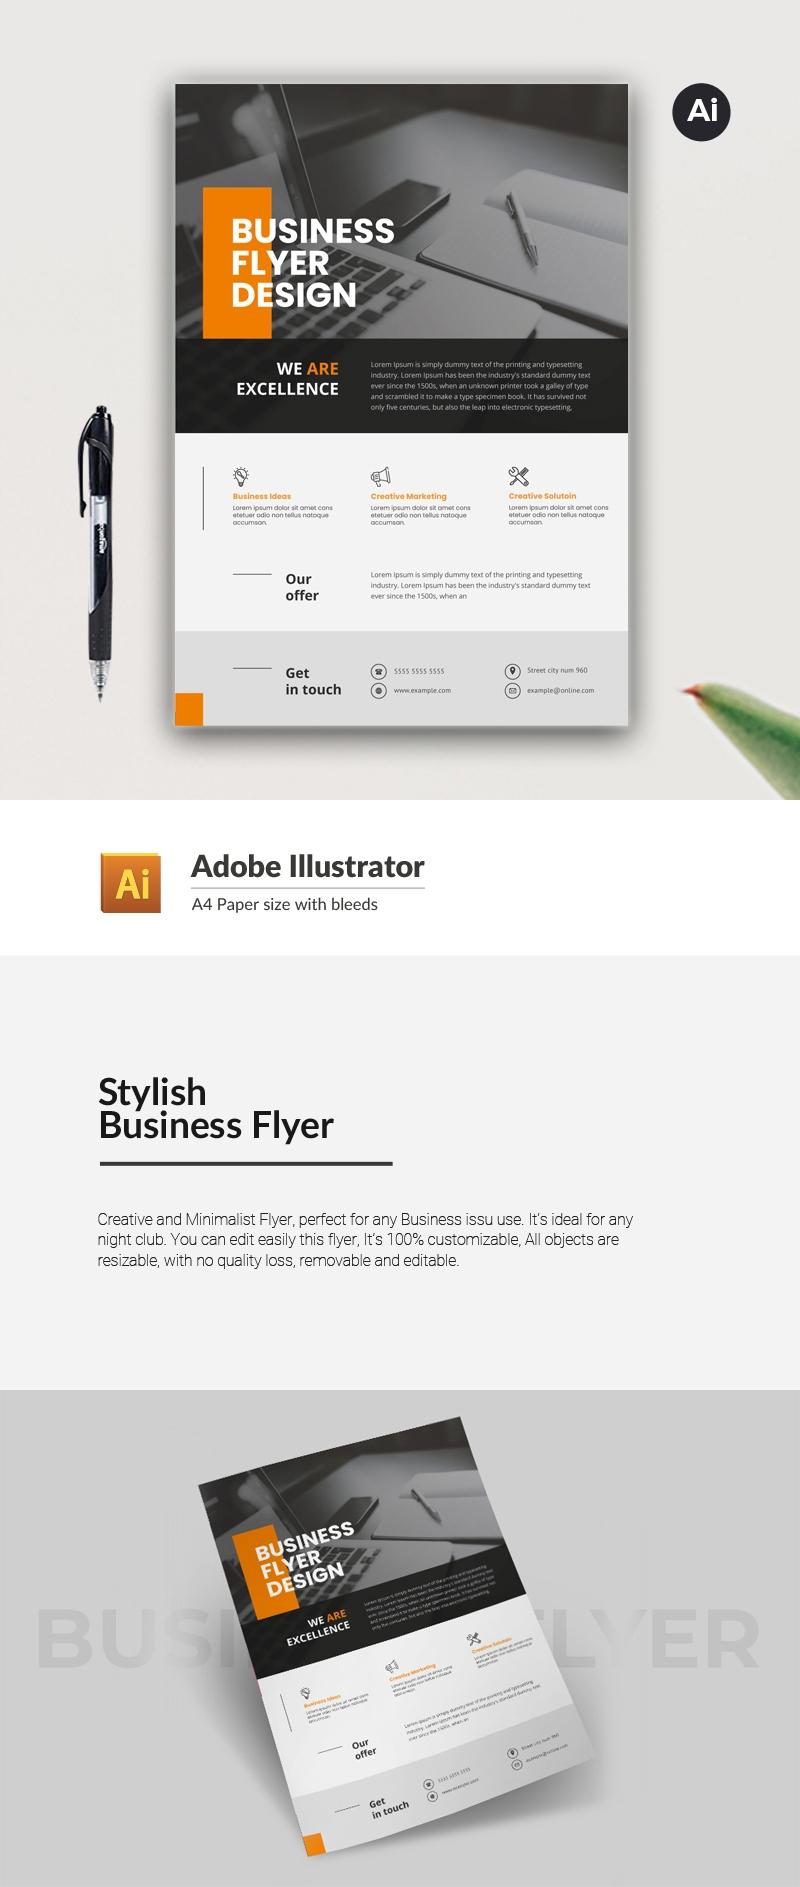 Stylish Business Flyer